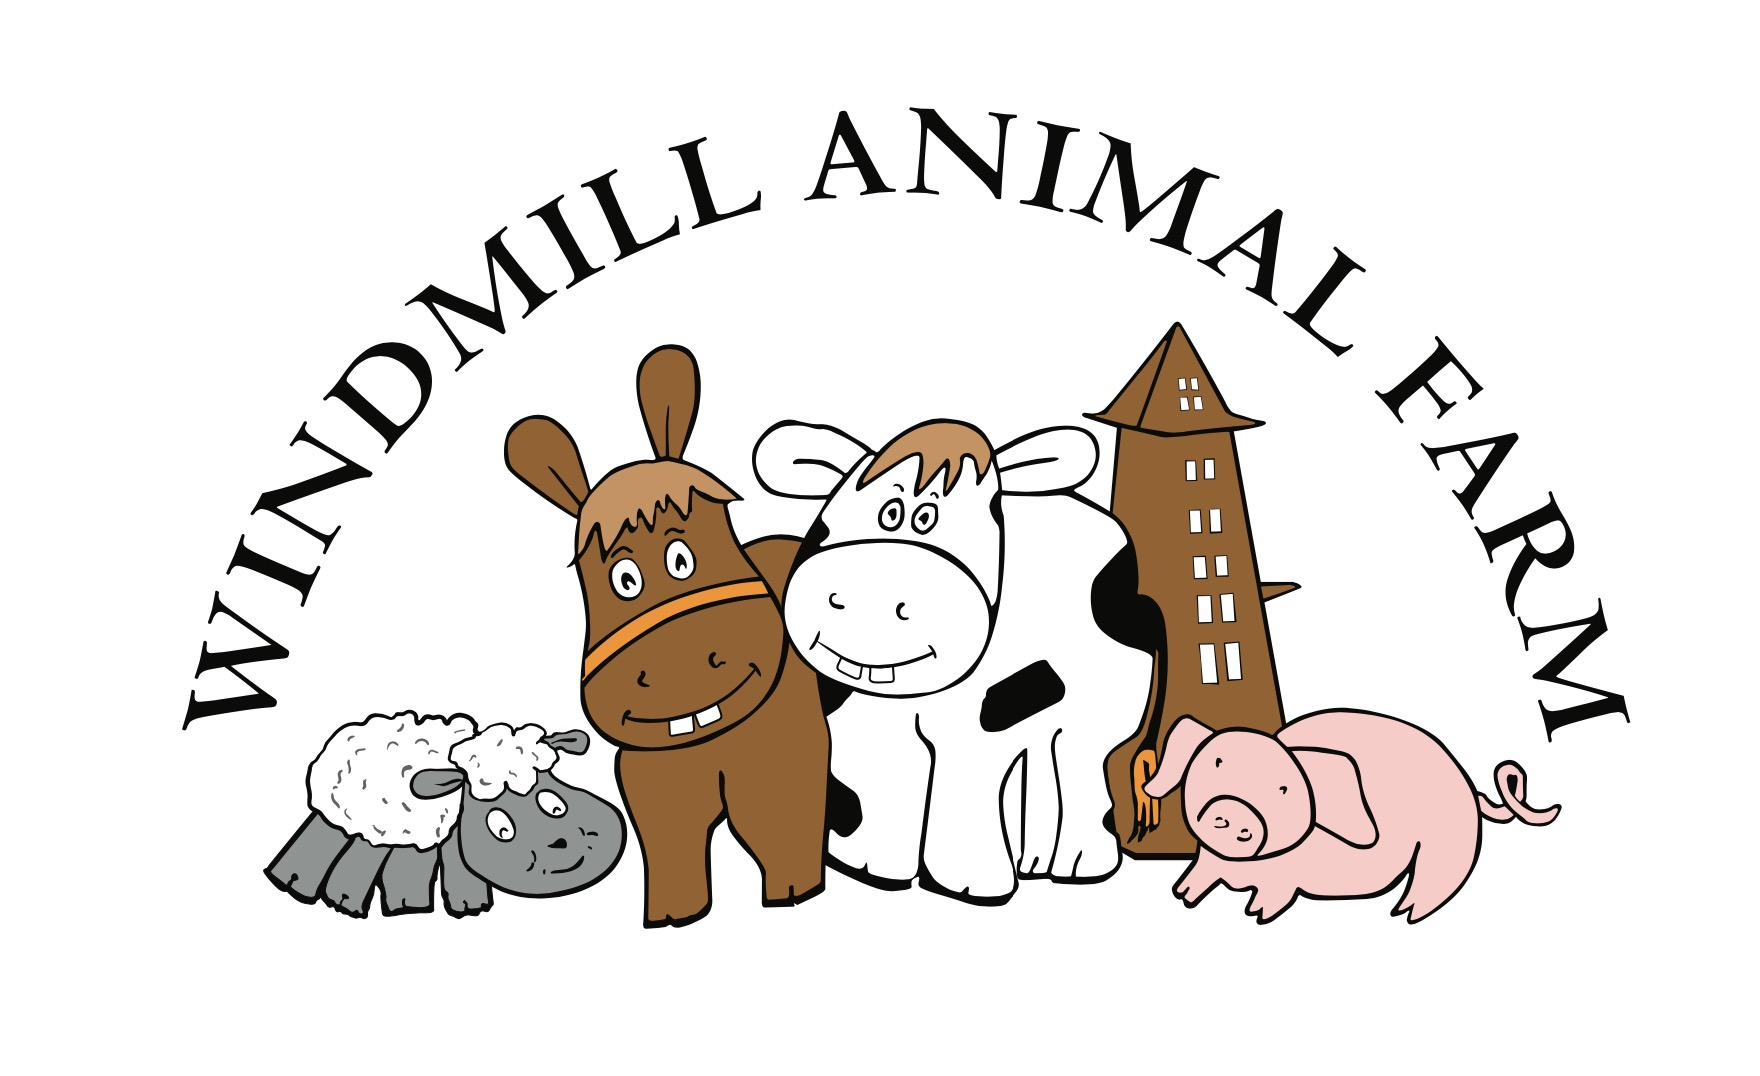 windmill animal farm website design